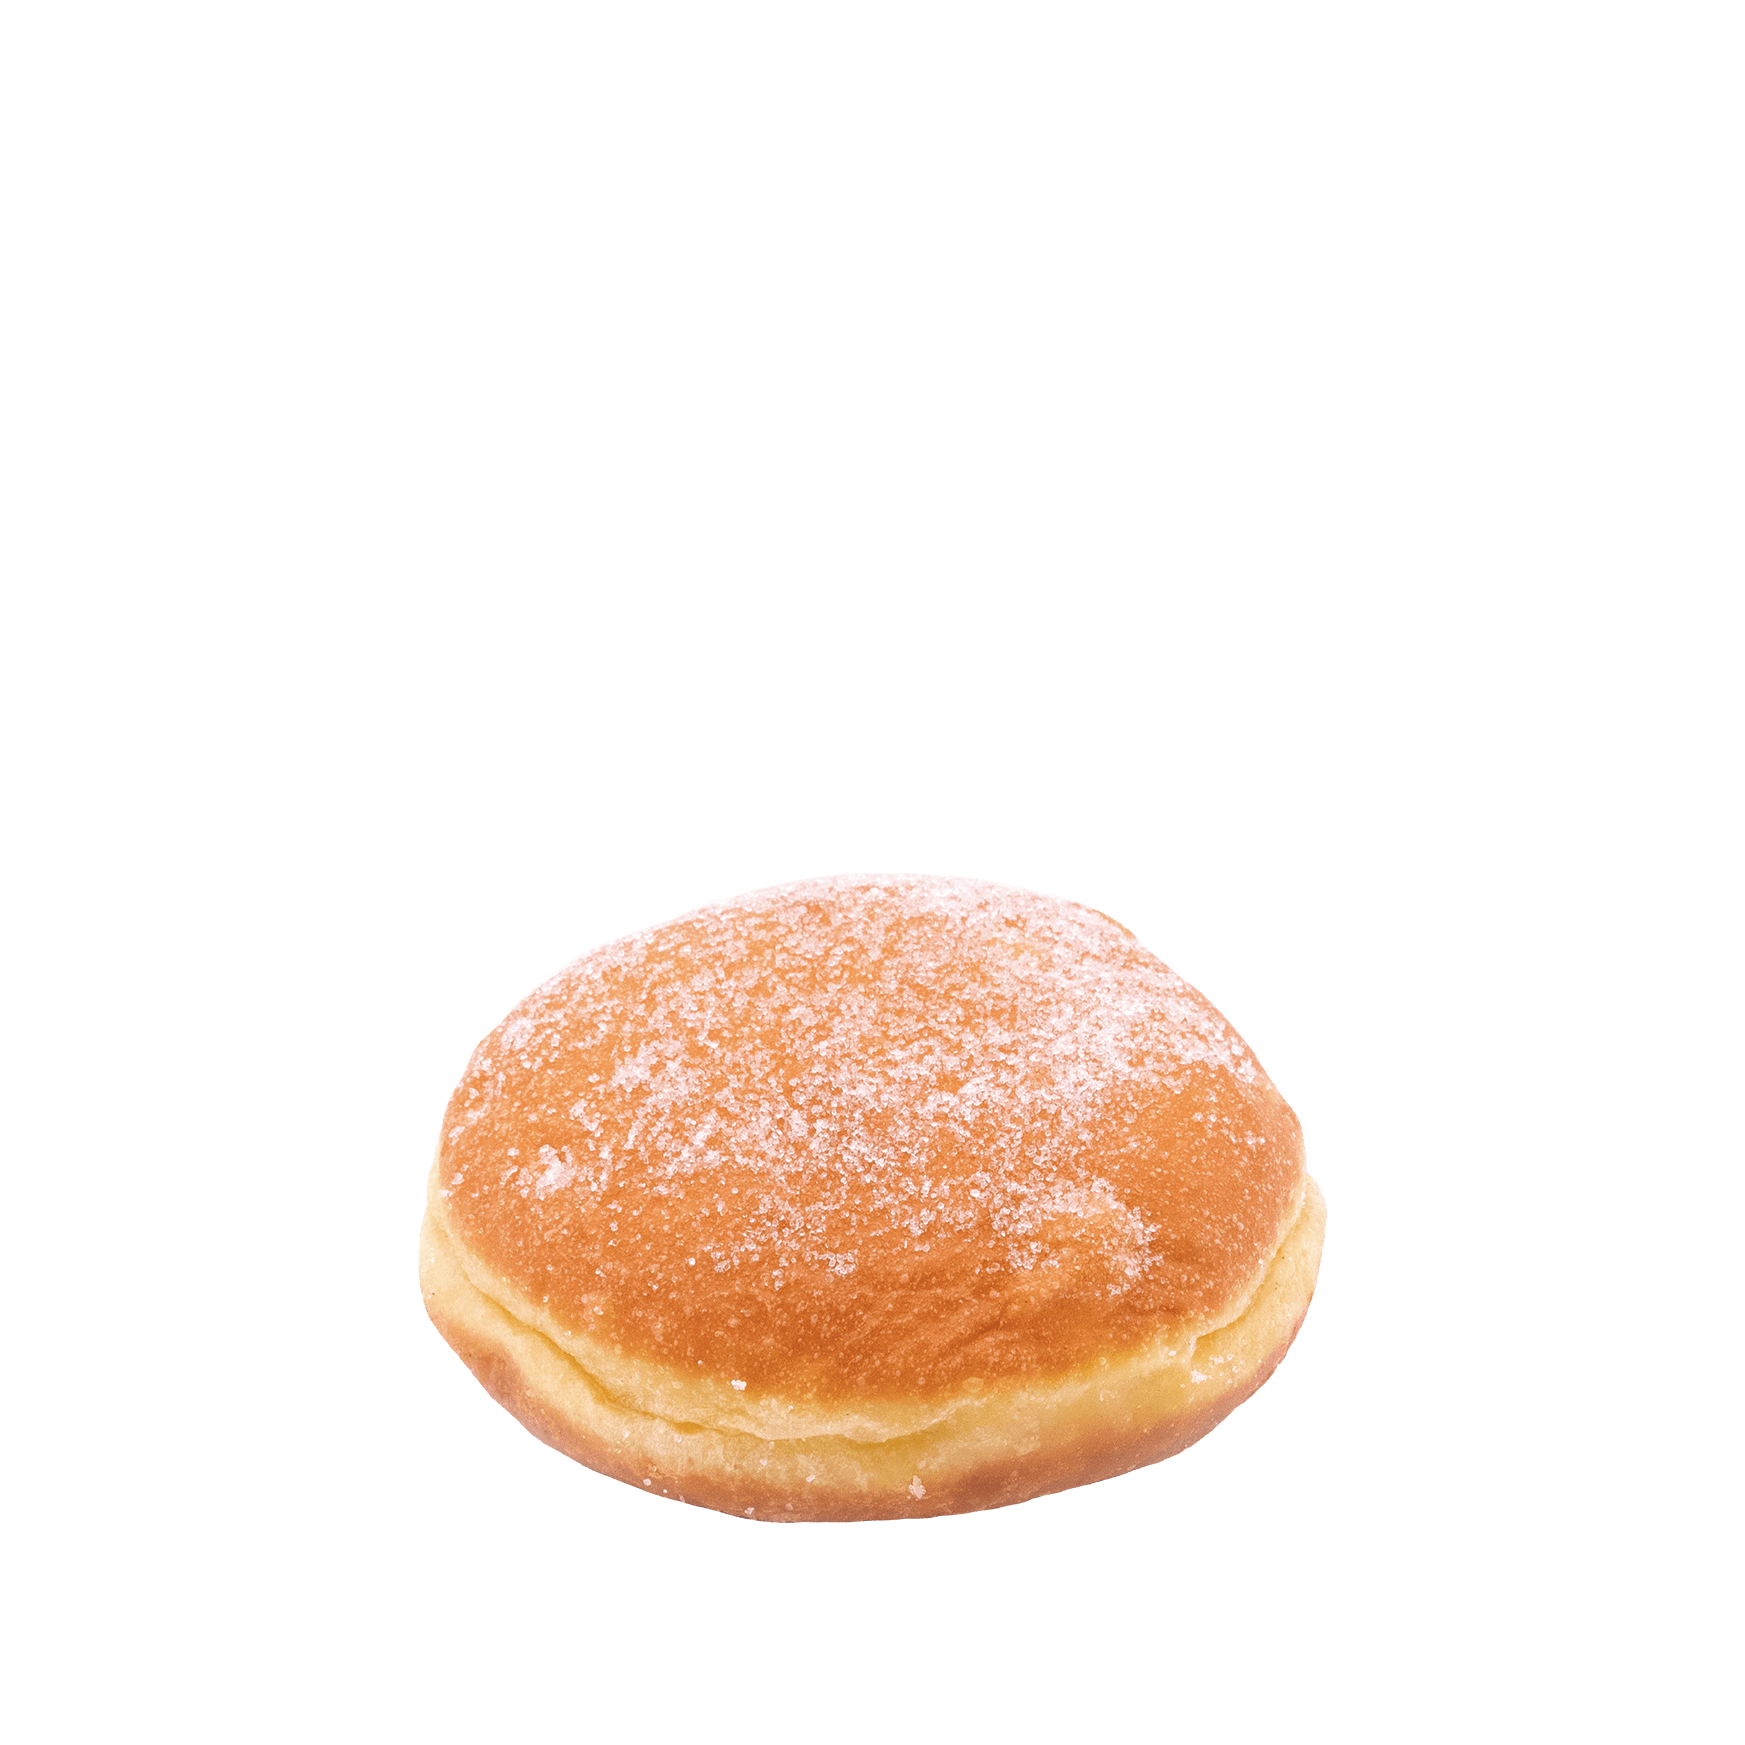 simples-bola-berlim-atelier-doce-alfeizerao-doces-conventuais